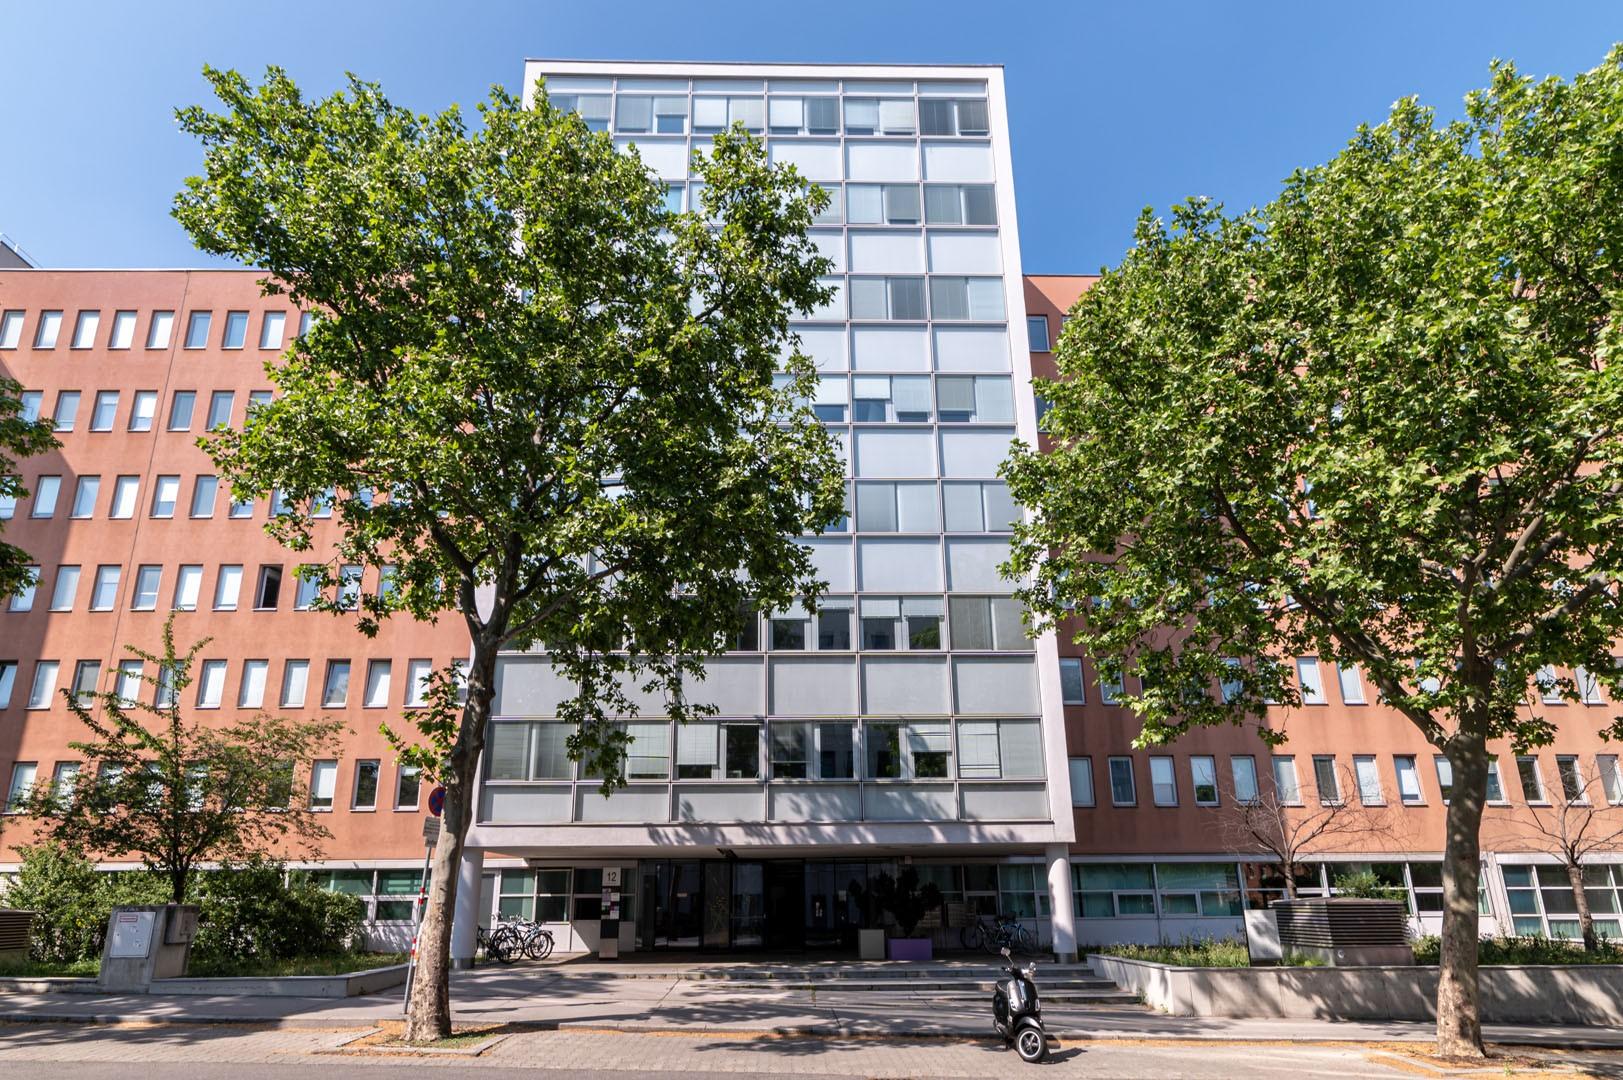 Gebäude Dermatologie 11, 1100 Wien, Brehmstraße 13